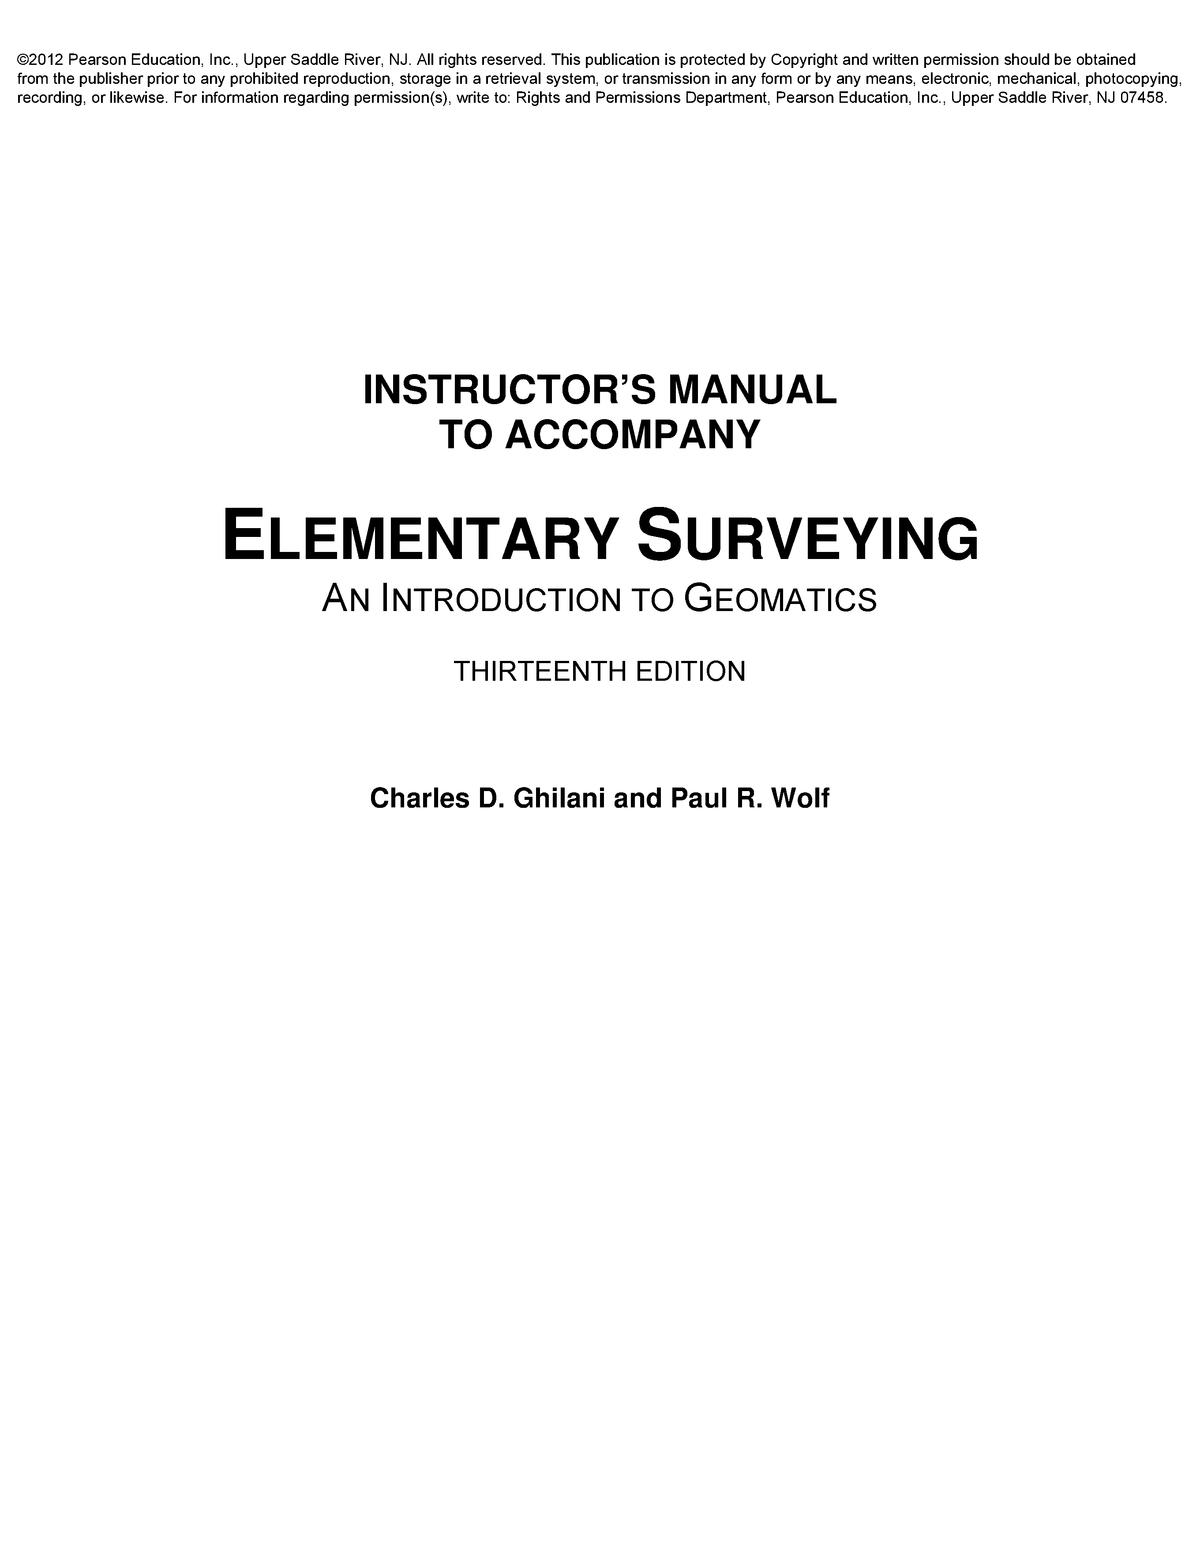 stat 3820 homework 3 solutions